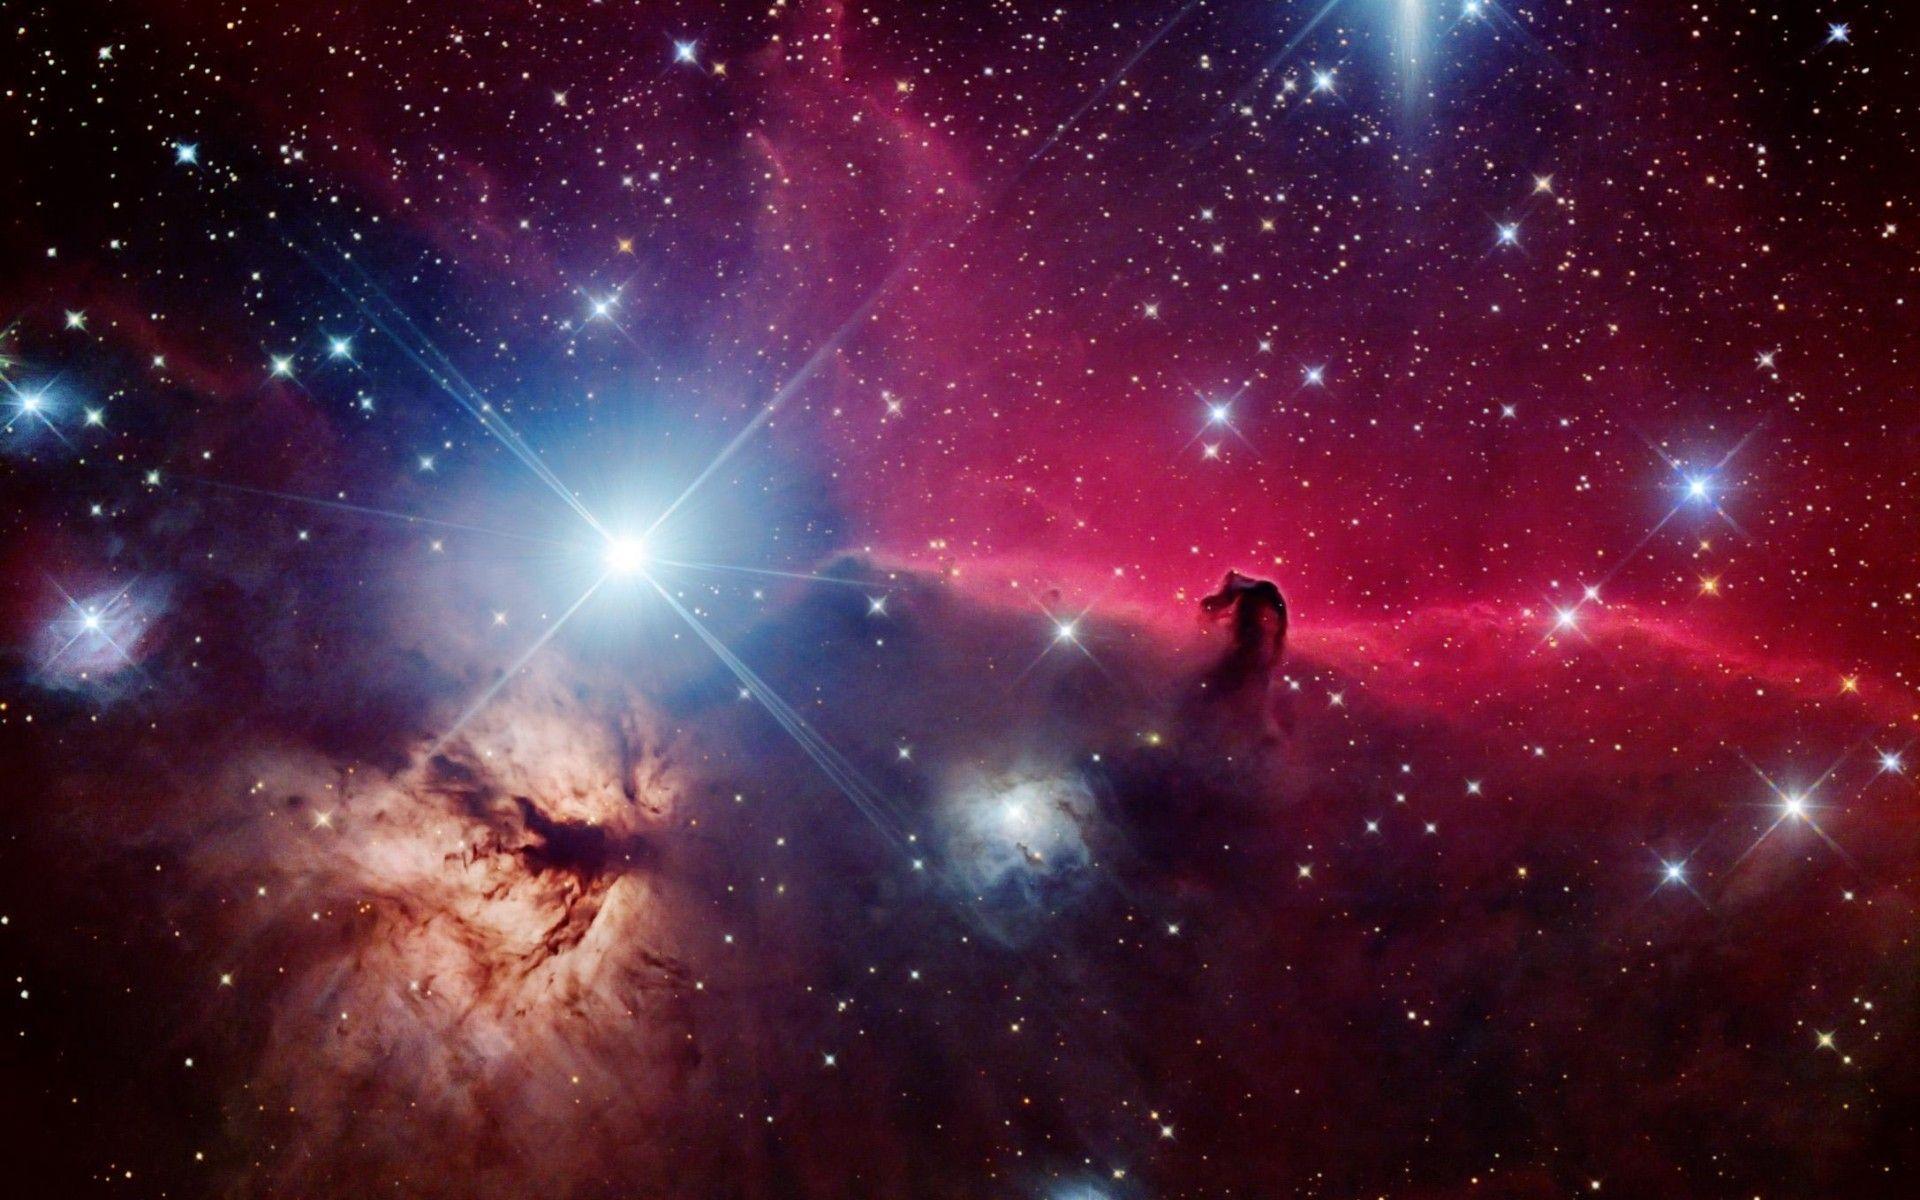 Horsehead Nebula Wallpapers Background Nebula wallpaper